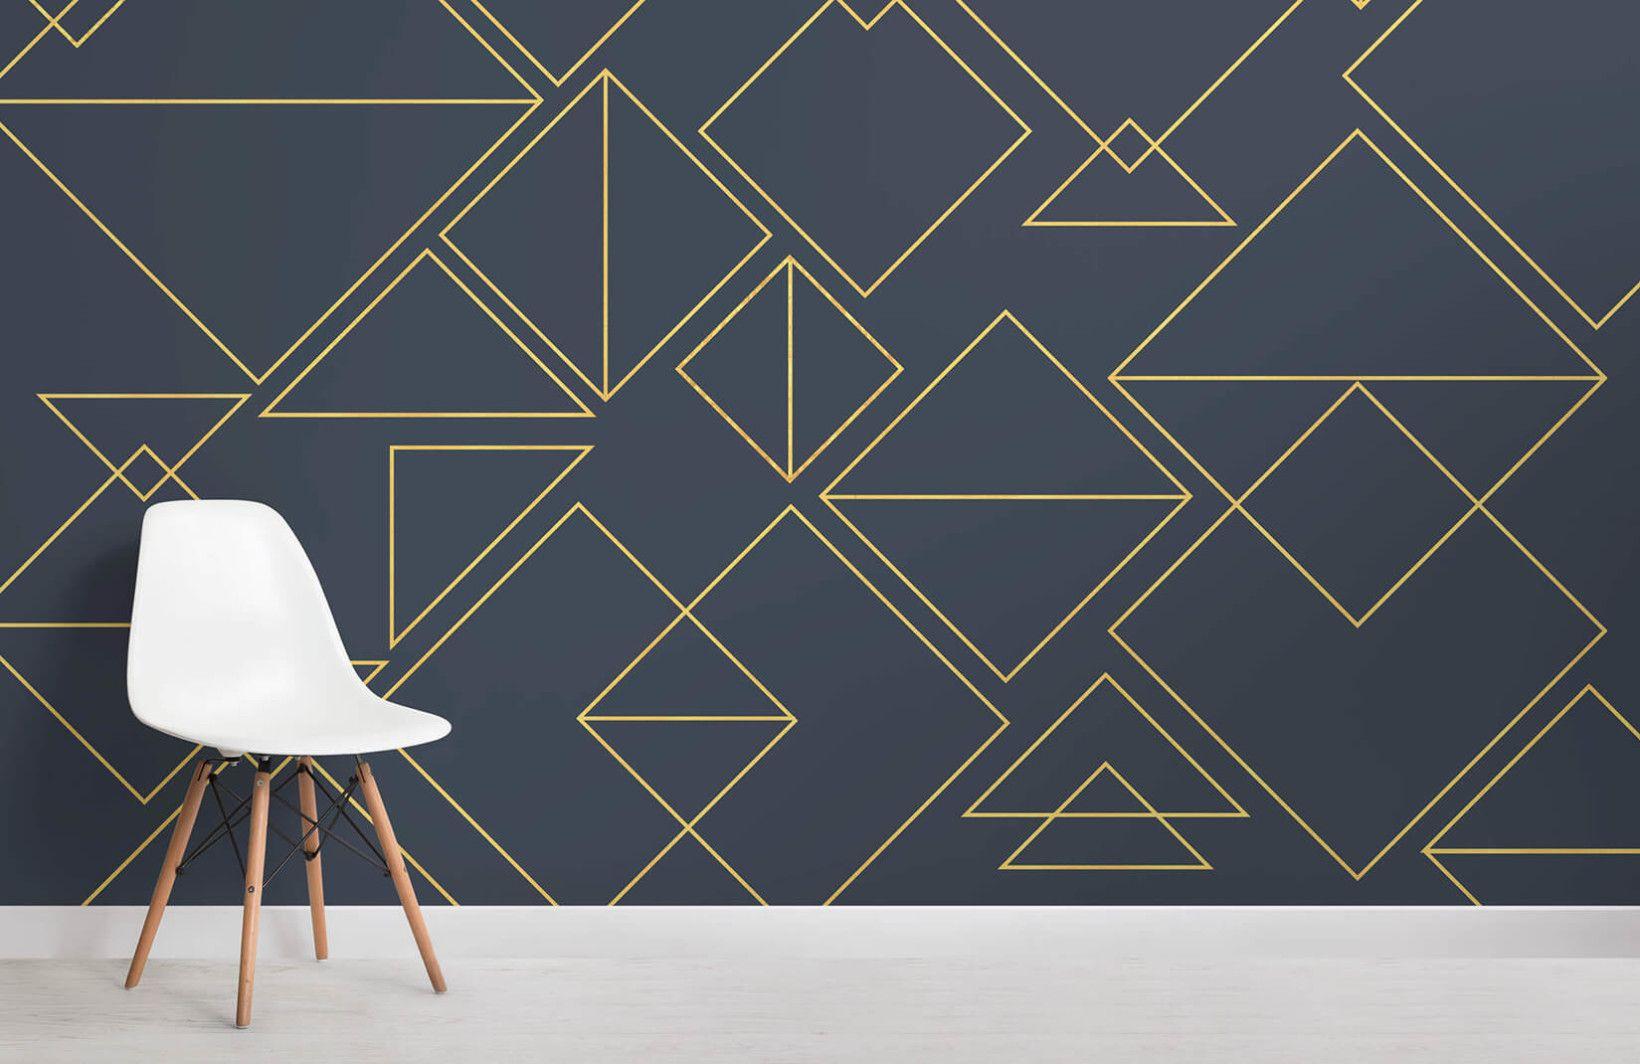 Triangles Wall Art Wall Decor Minimalist Wall Mural Modern Geometric Temporary Wallpaper Wallpaper Removable Wallpaper Minimal